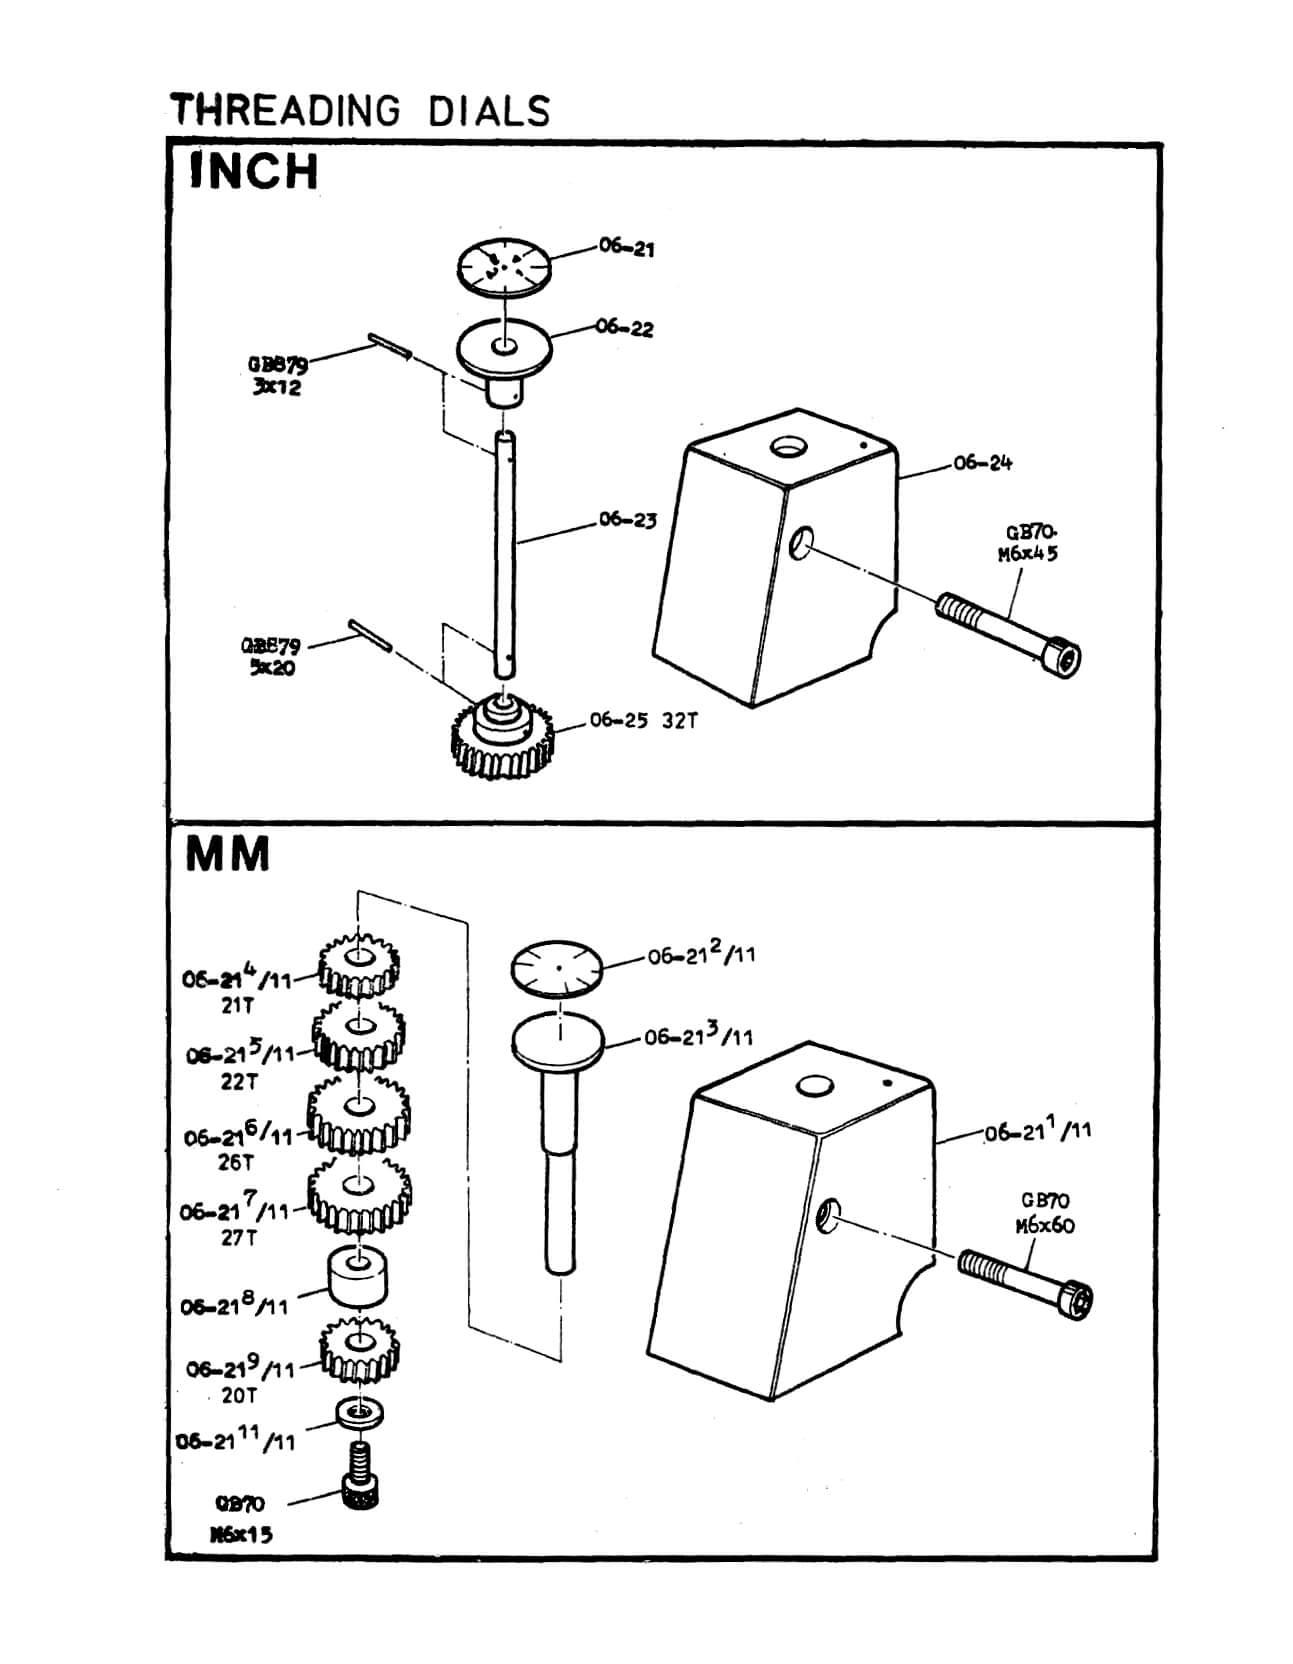 Enco warco jet asian 1330 1340 1430 1440 metal lathe instructions operator's parts manual